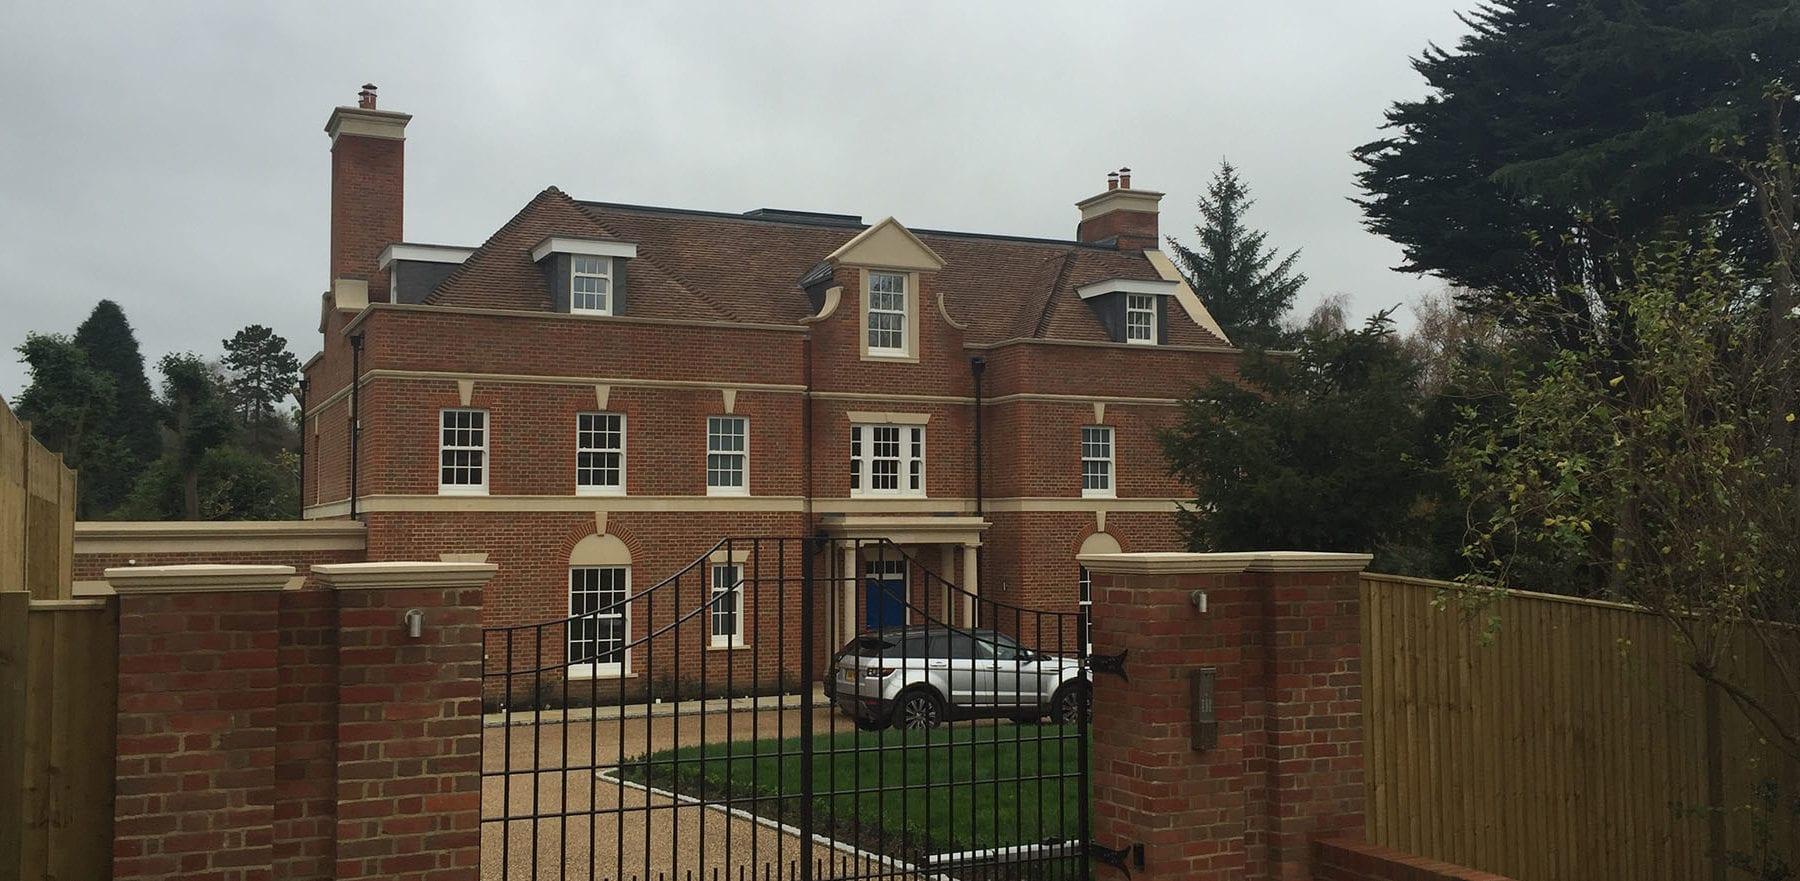 Lifestiles - Handmade Brown Clay Roof Tiles - Tunbridge Wells, England 4